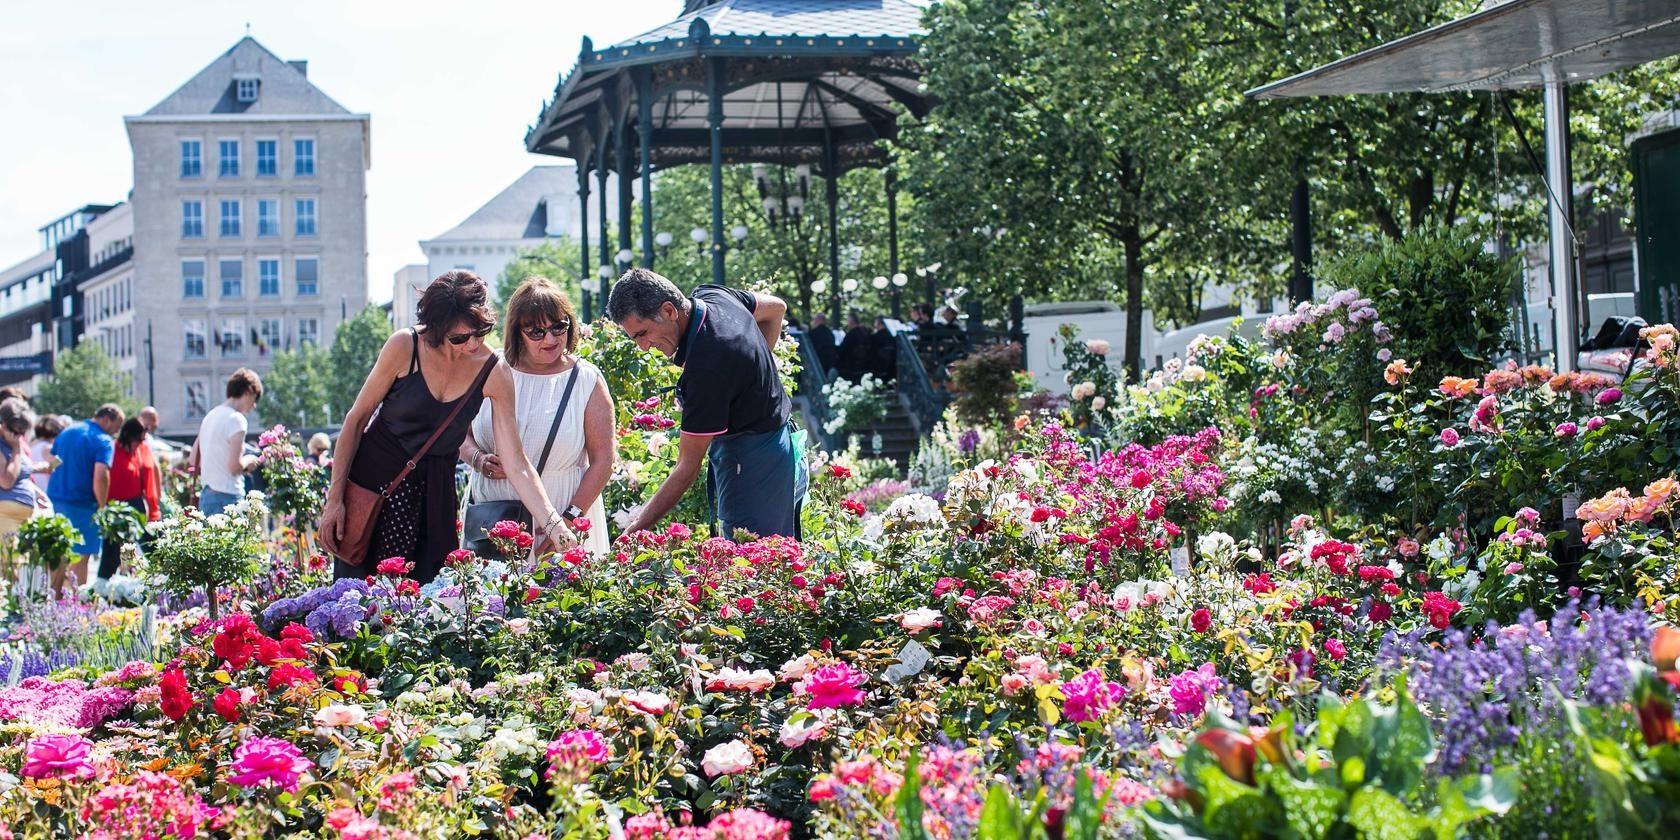 flower market at the Kouter